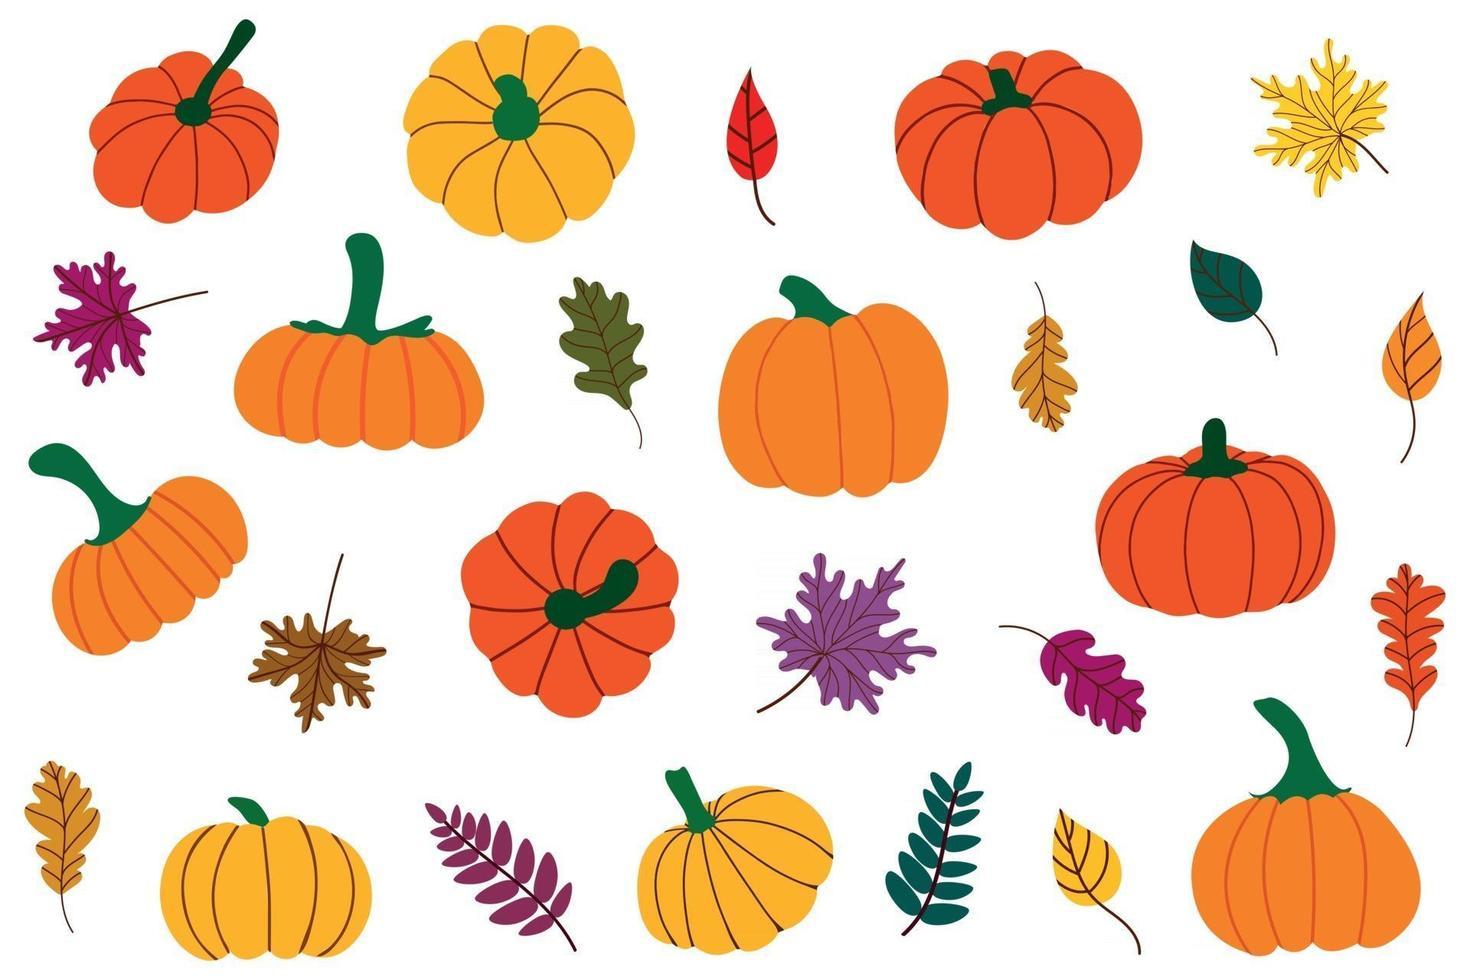 Autumn fallen leaves and pumpkins. Thanksgiving Set, Harvest, Halloween.Vector Illustration vector